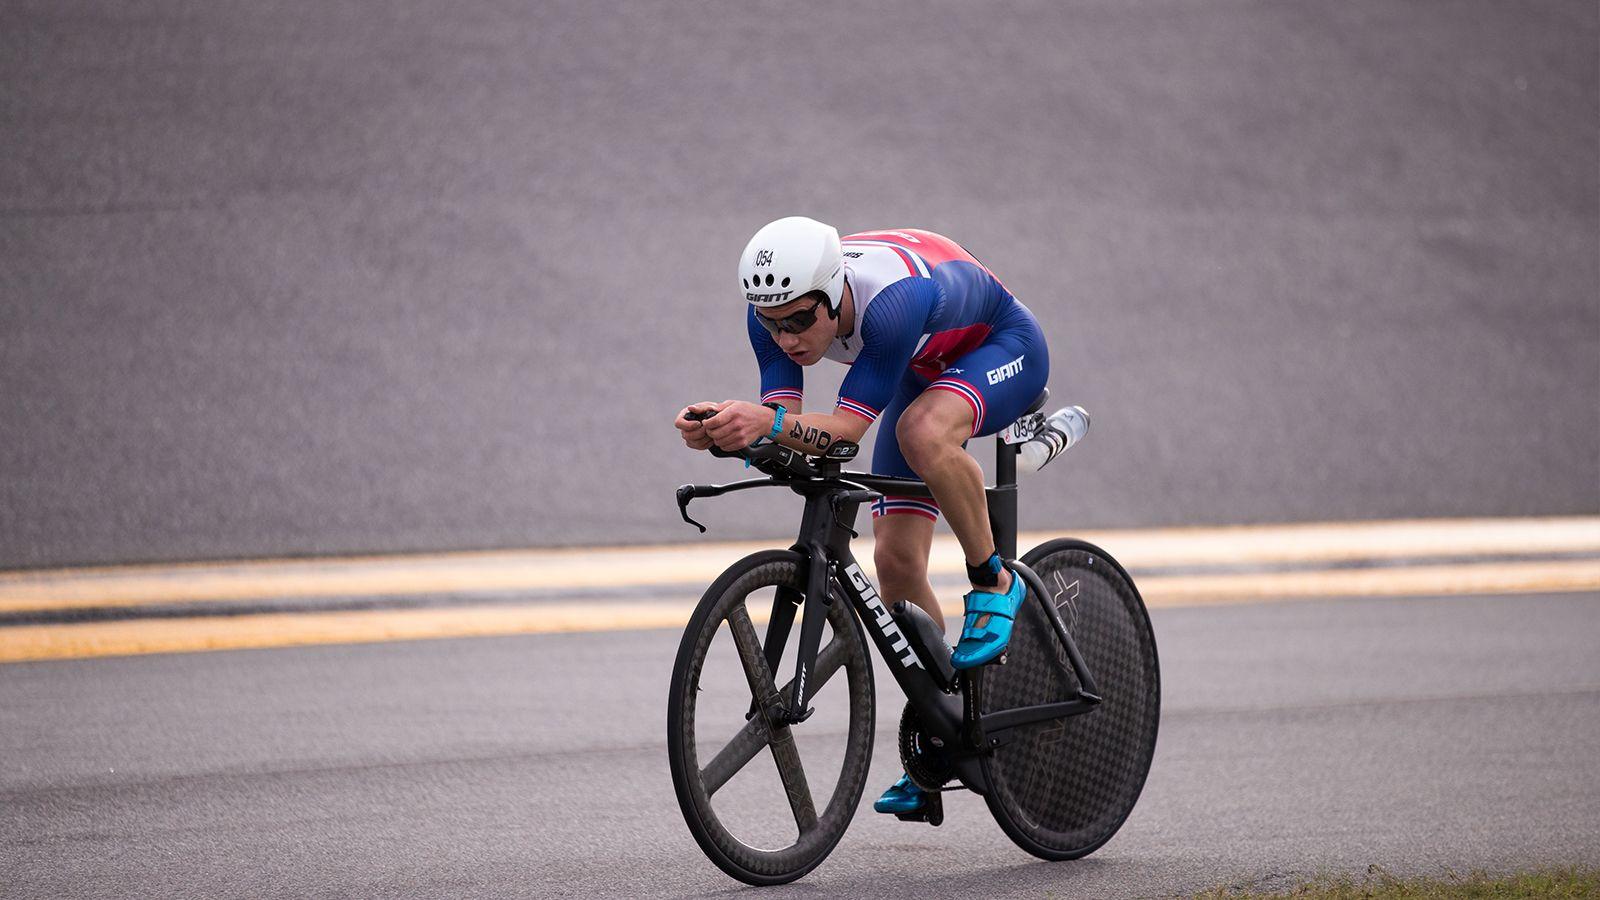 Not a one-hit wonder: Gustav Iden showcases talent in PTO 2020 Championship triumph